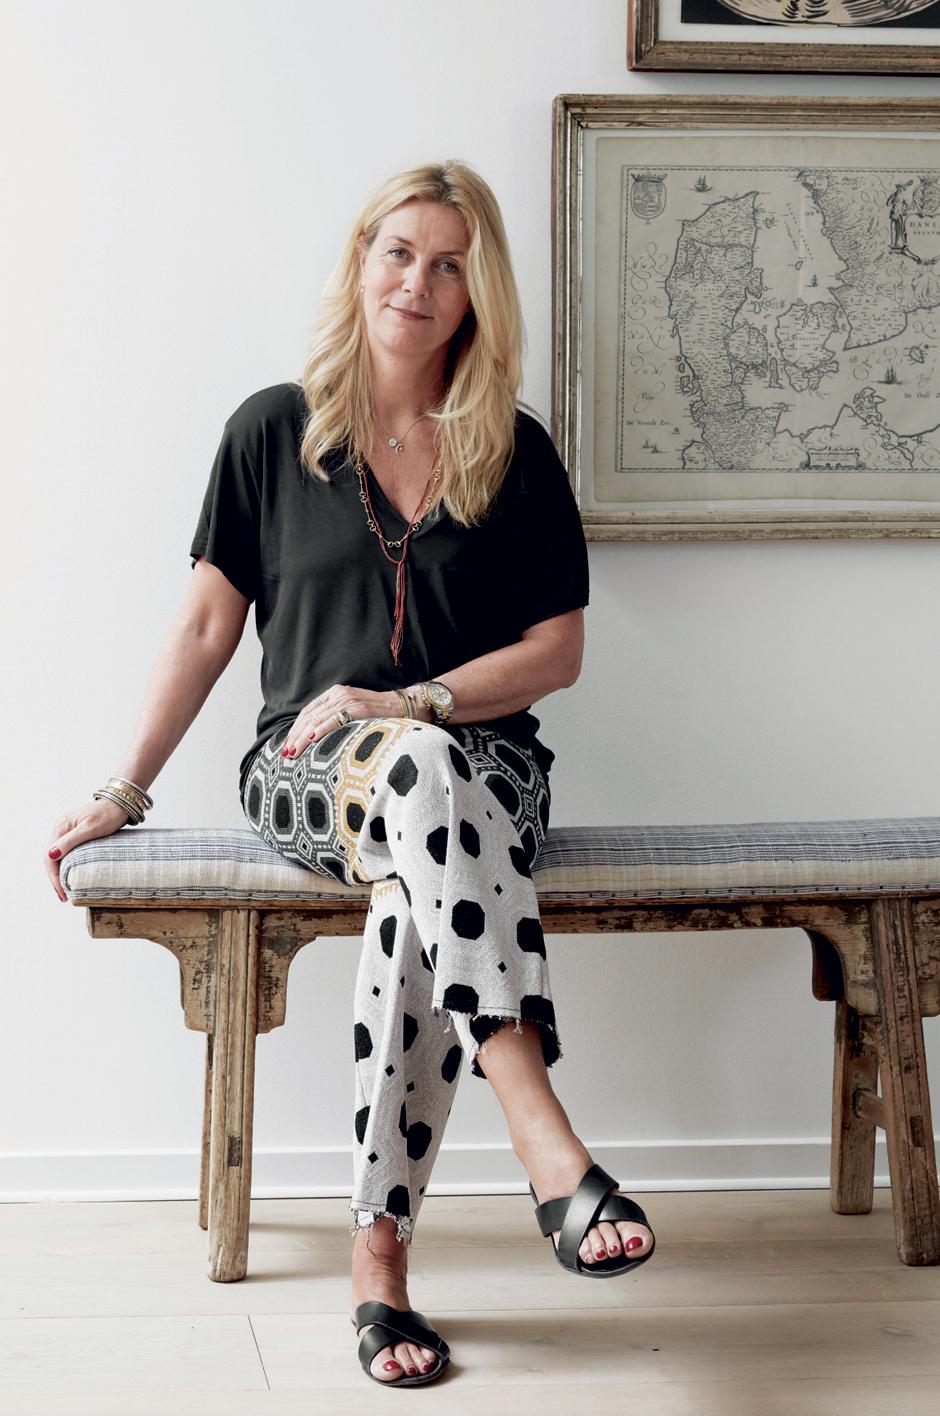 Marlene Juhl Jørgensen